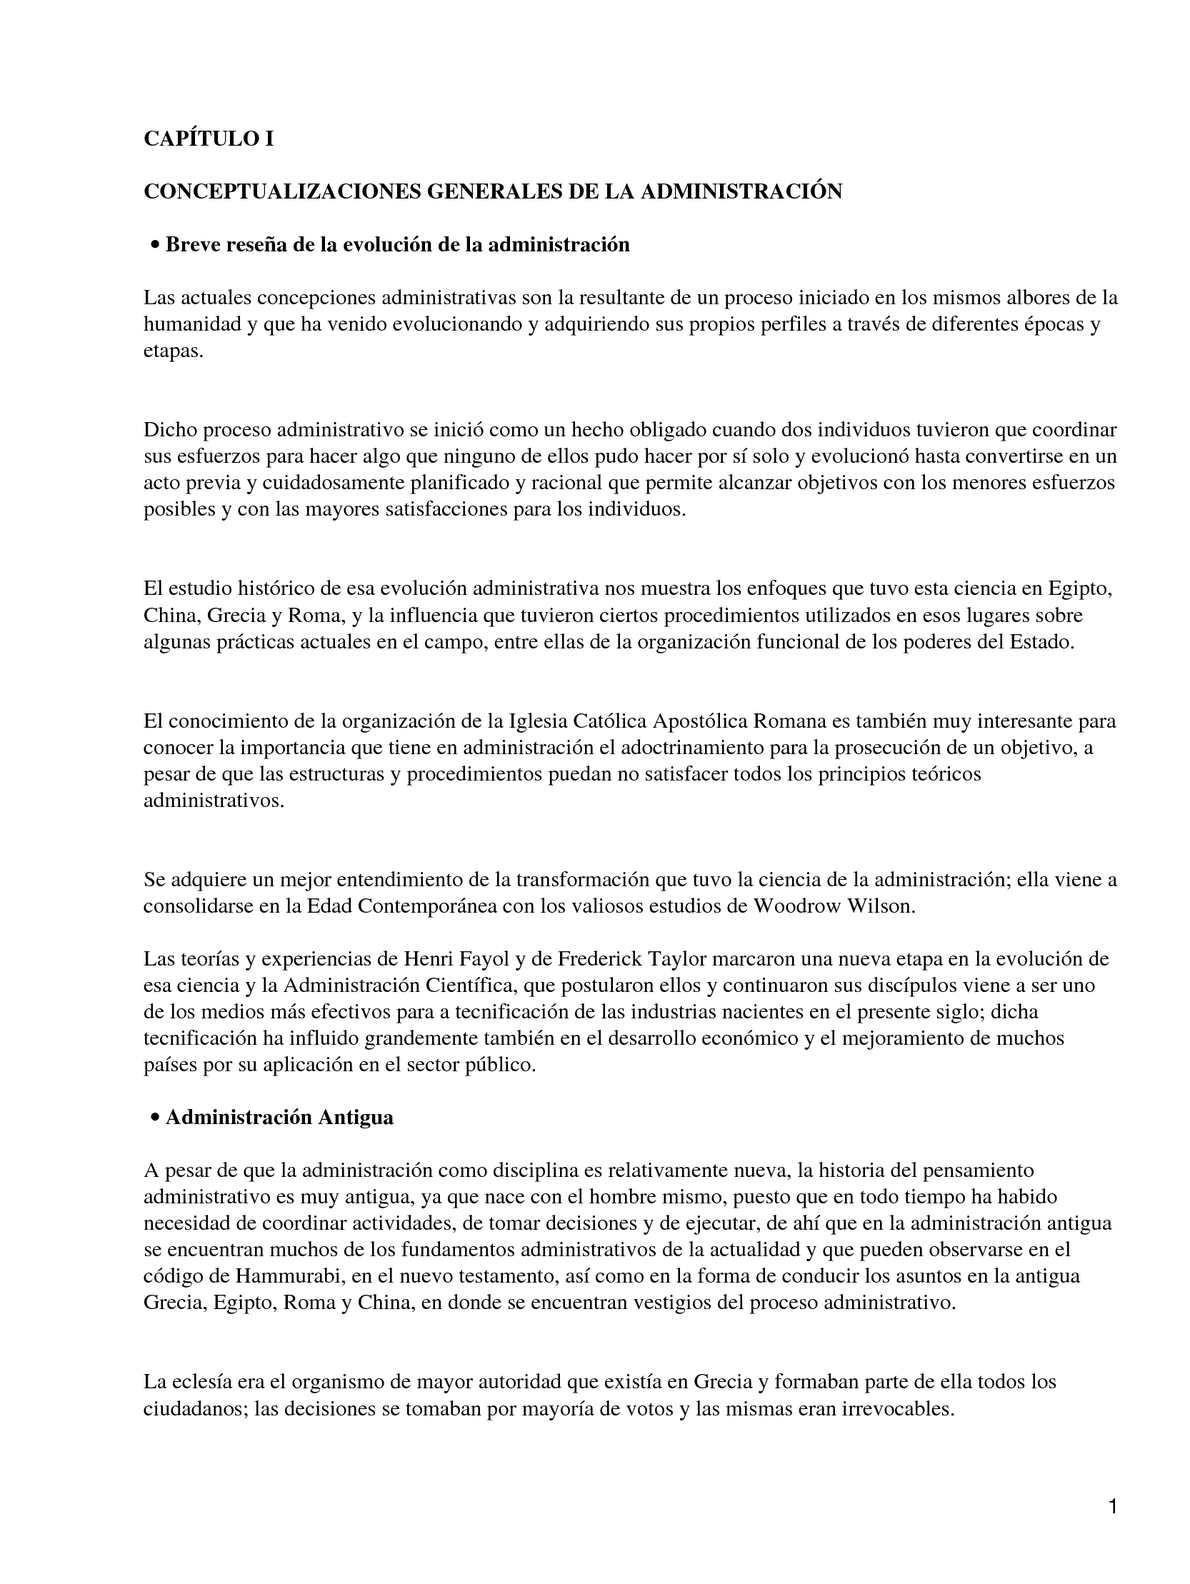 Agustin reyes ponce proceso administrativo pdf writer